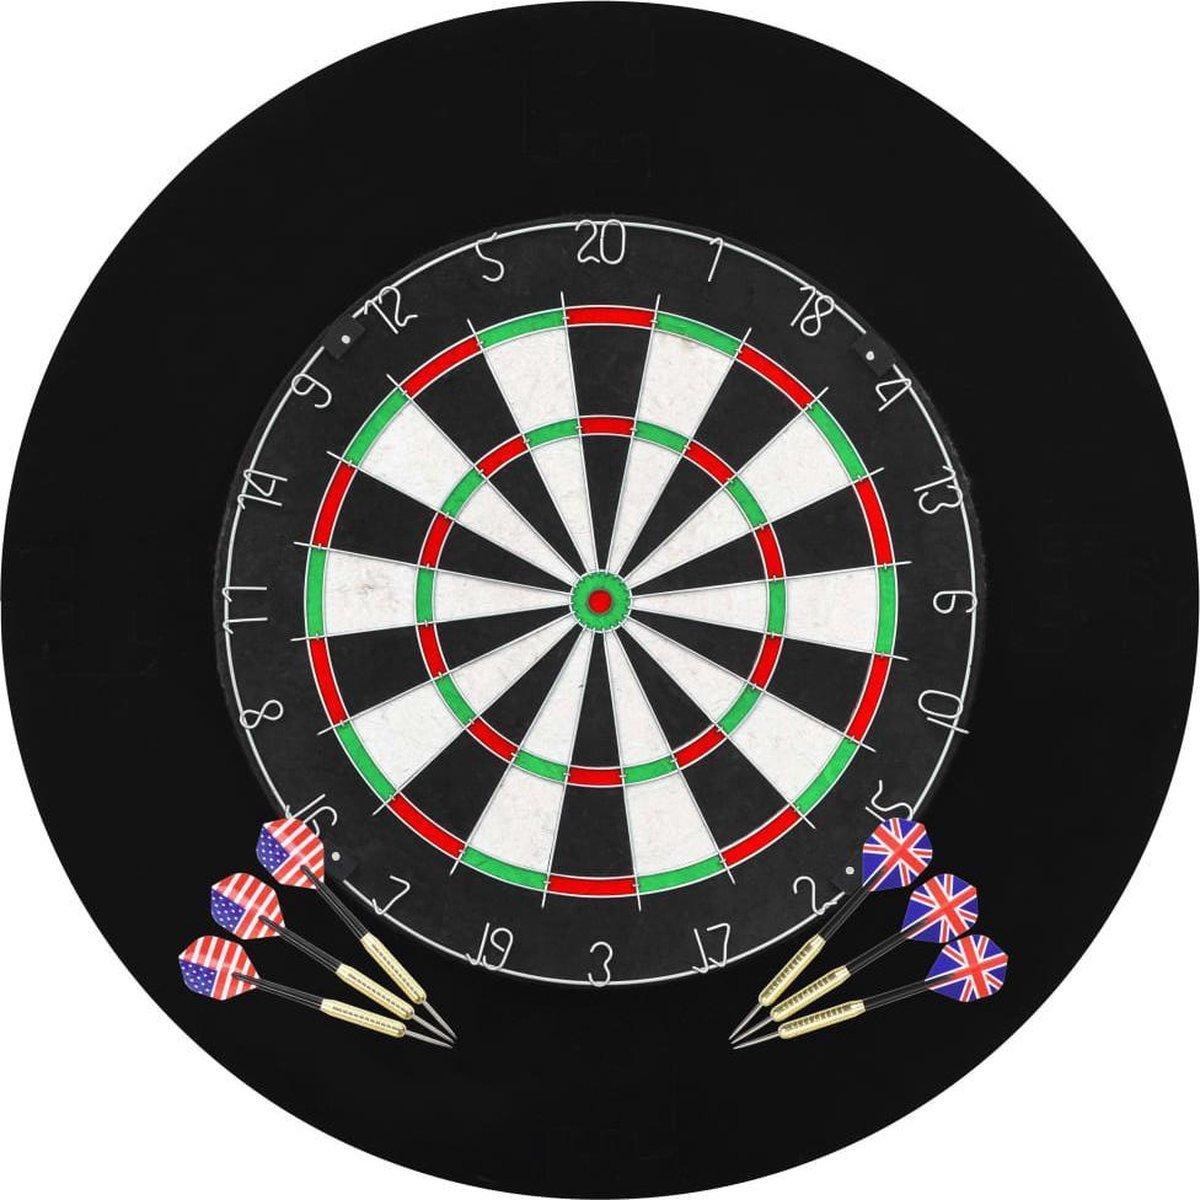 Dartbord professioneel met 6 darts en surround sisal - Dartset